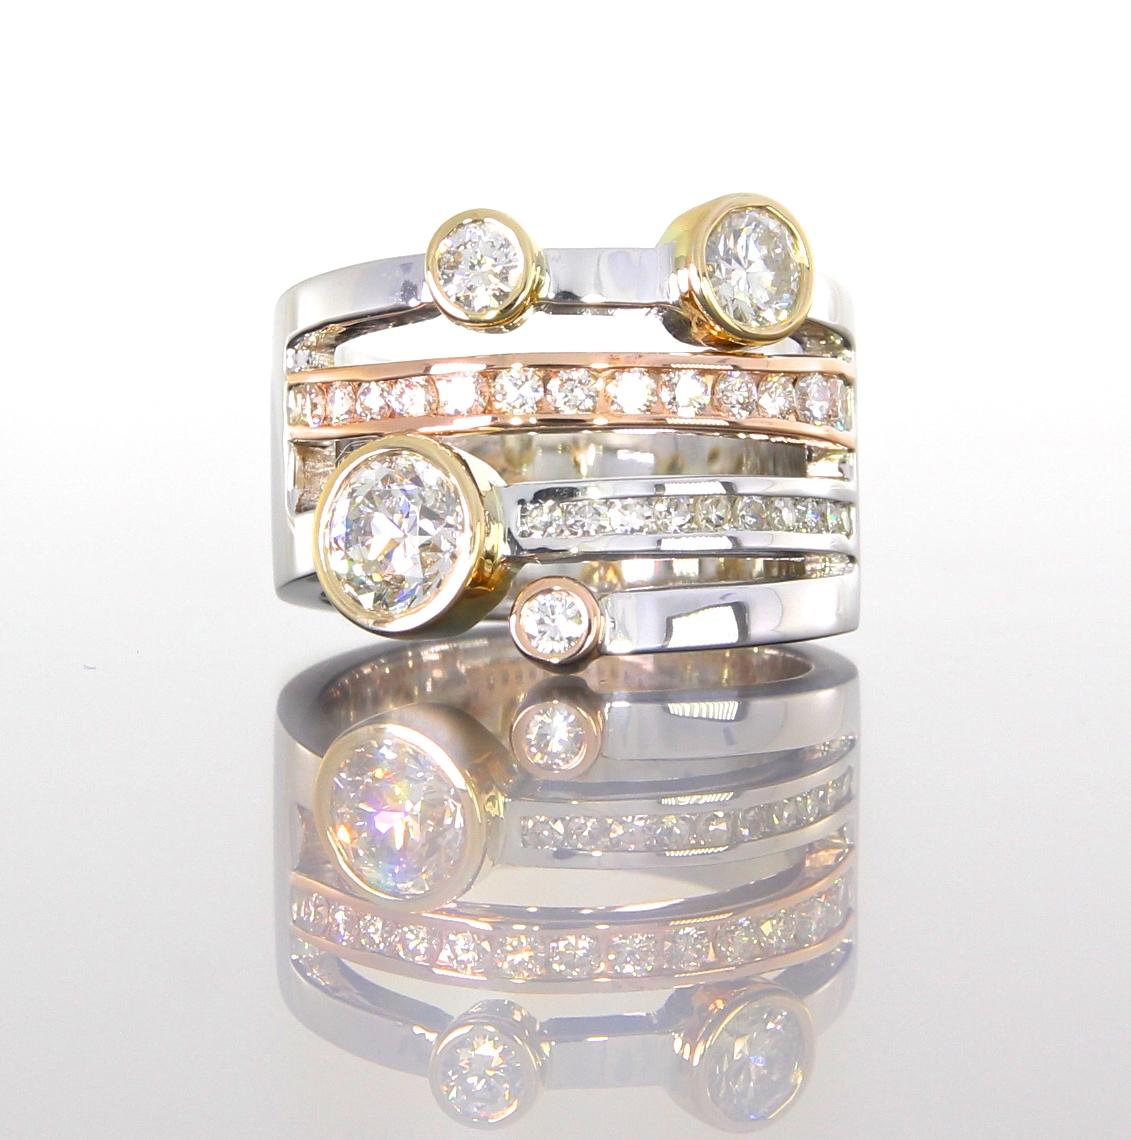 unique-modern-diamond-redesign-rose-white-yellow-gold-craft-revival-jewelry-store-grand-rapids.jpg